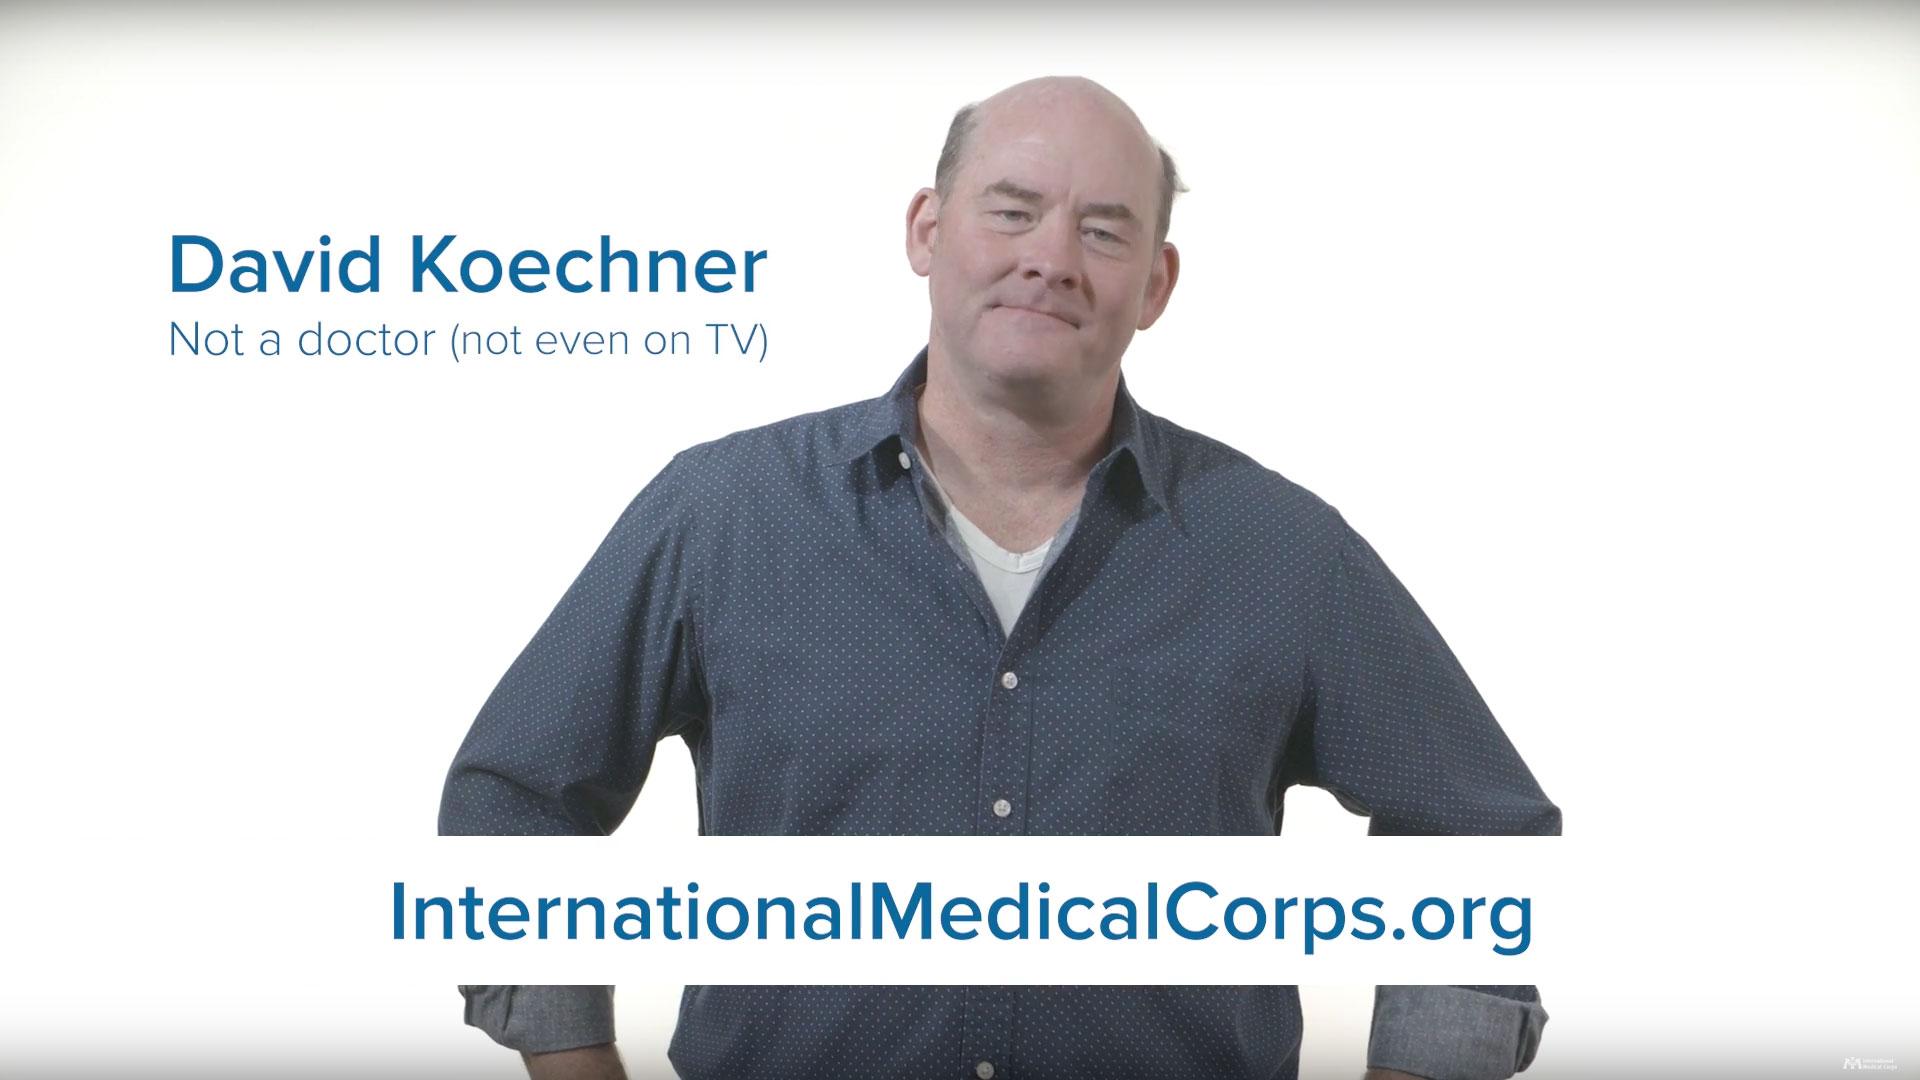 David Koechner for International Medical Corps